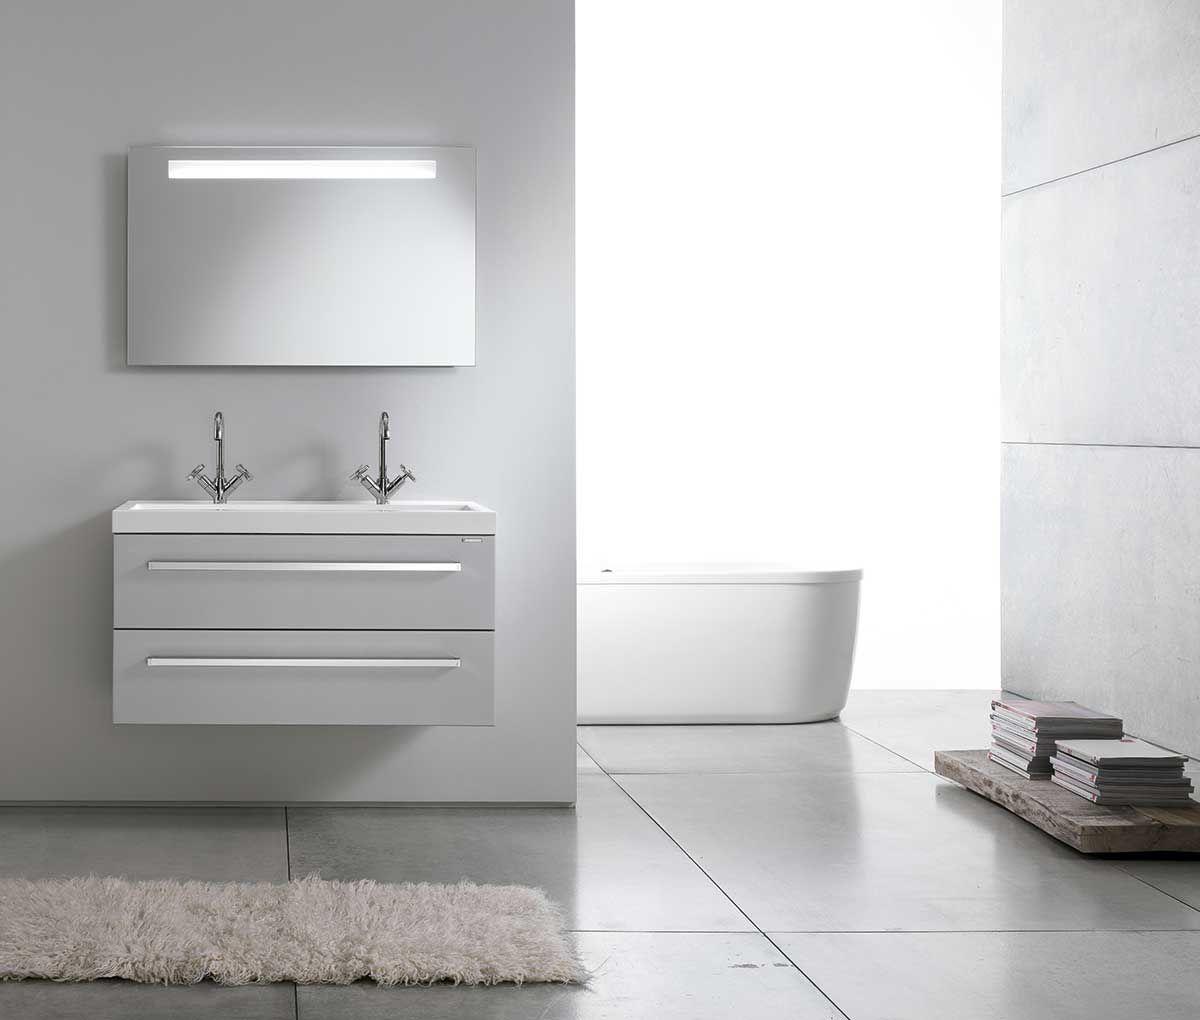 Berloni bagno art berloni bath cabinetry for Arredo bagno berloni